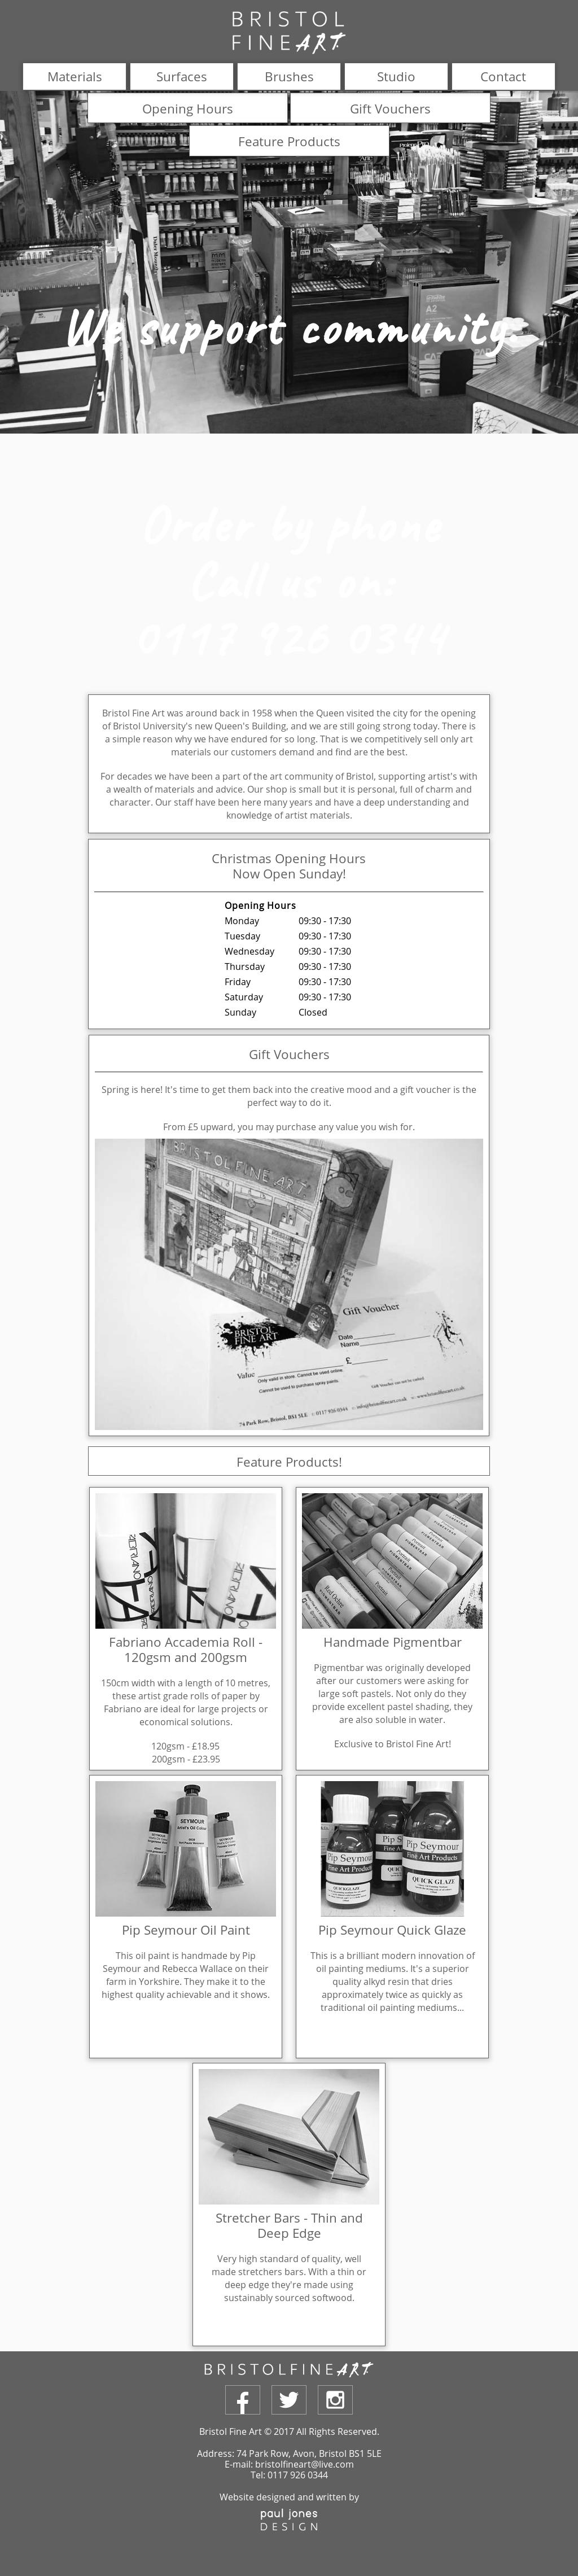 Bristol Fine Art Competitors, Revenue and Employees - Owler